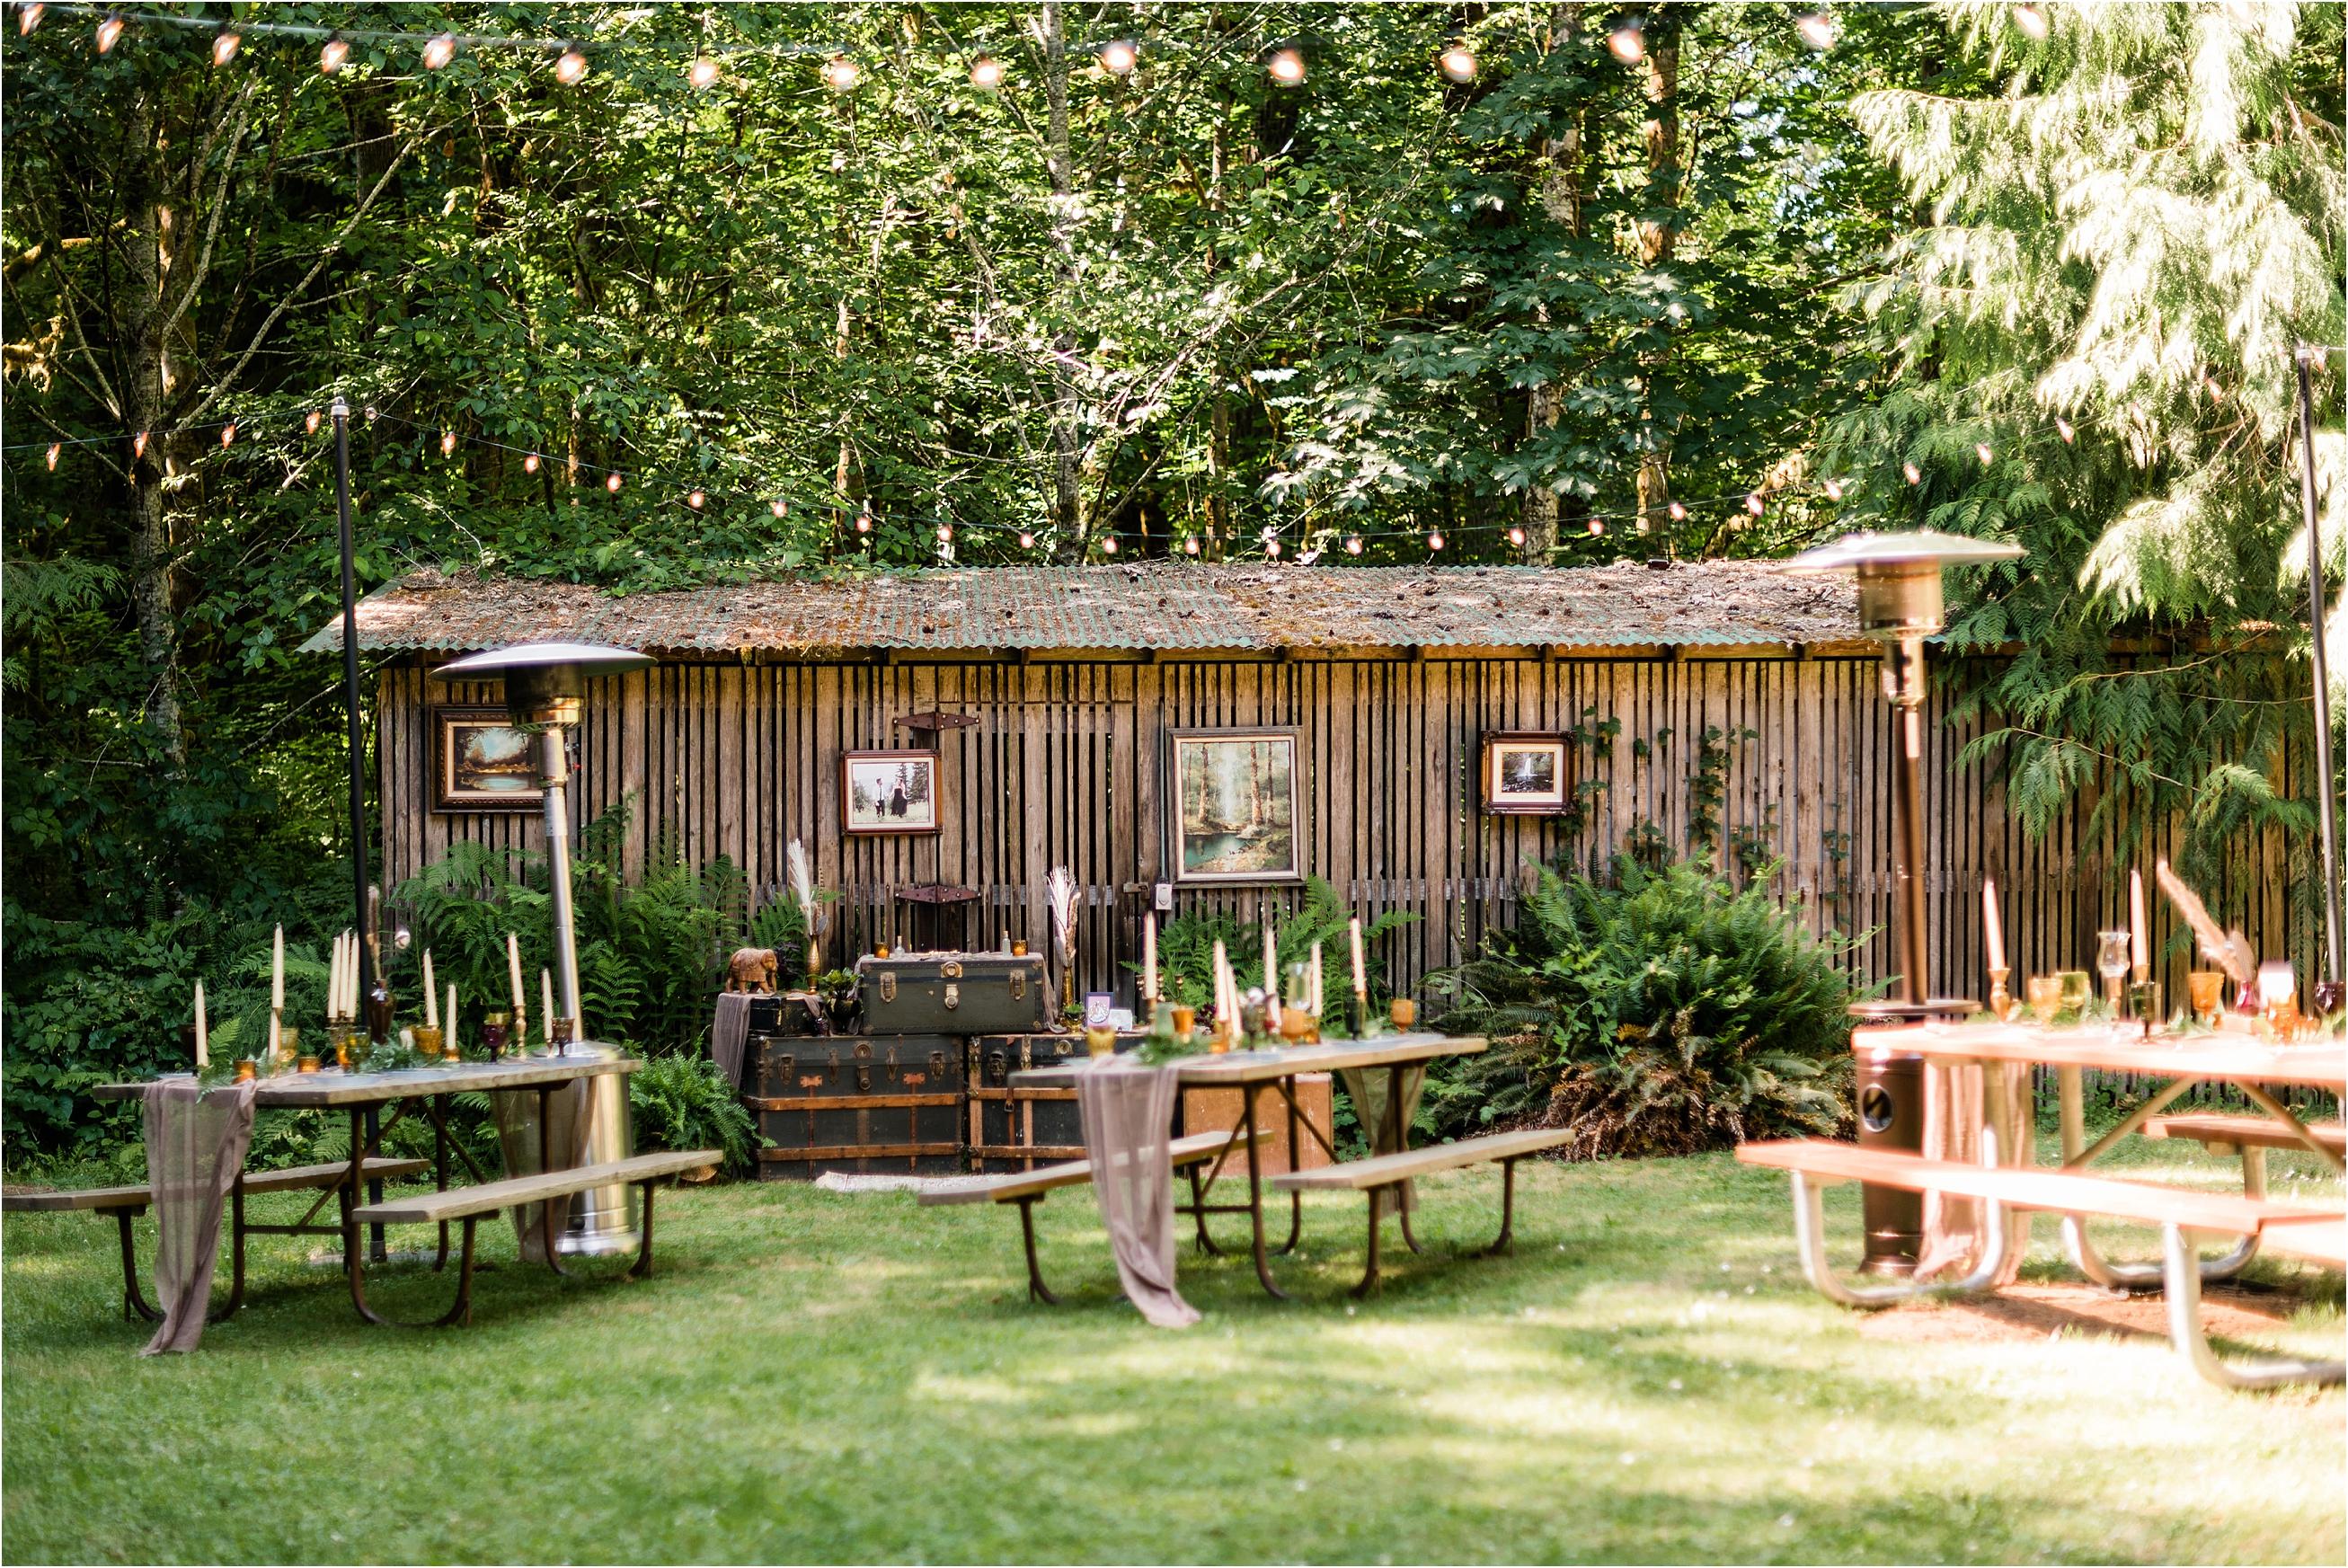 Reception Decor at Cassy & Viva's bohemian Oregon destination wedding at Camp Lane. Image by Forthright Photo.